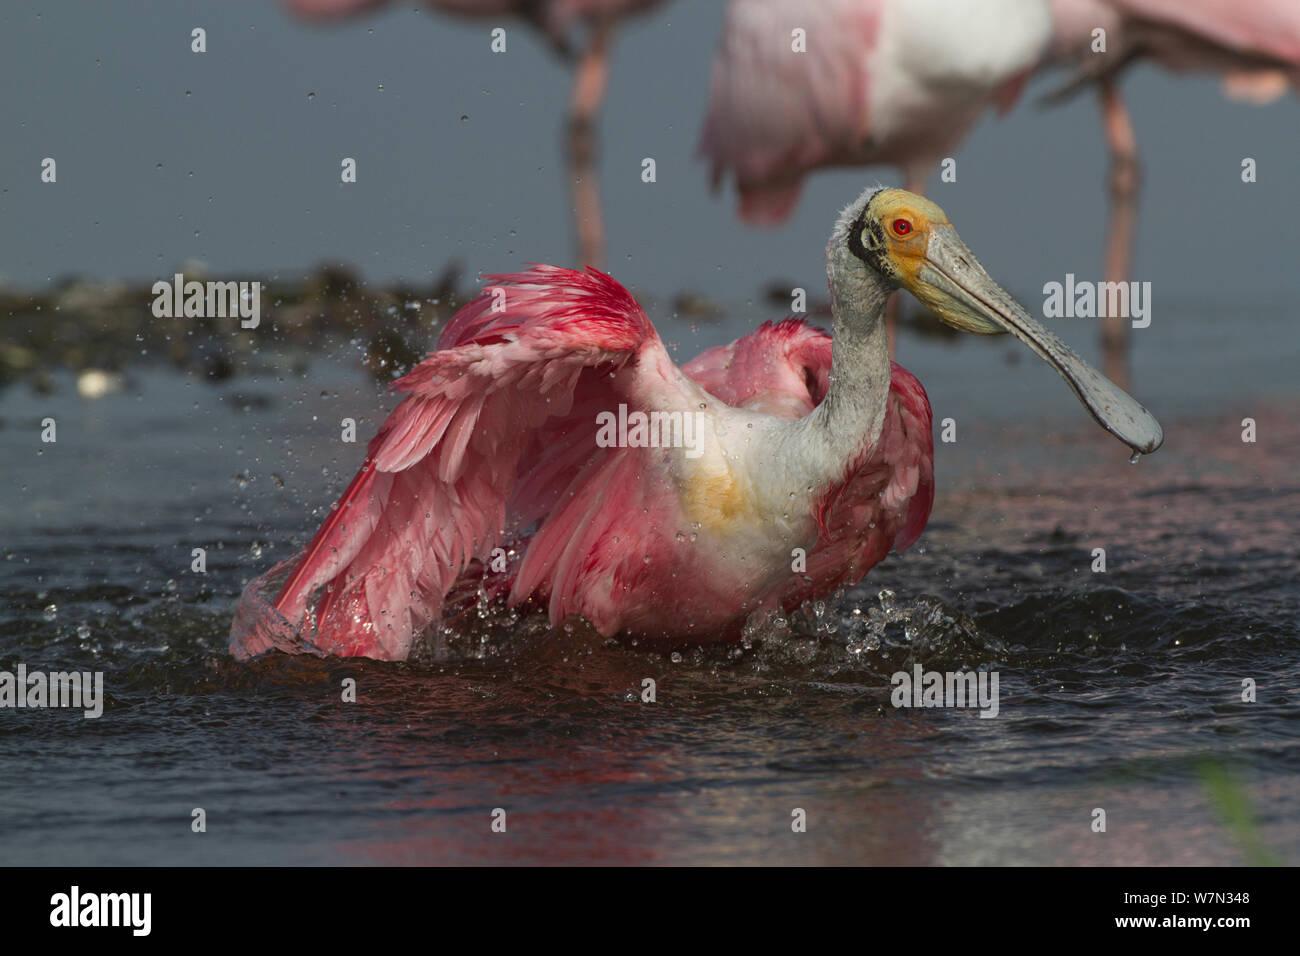 Adult Roseate Spoonbill (Platalea ajaja) in breeding plumage, bathing. Sarasota County, Florida, USA, April. Stock Photo